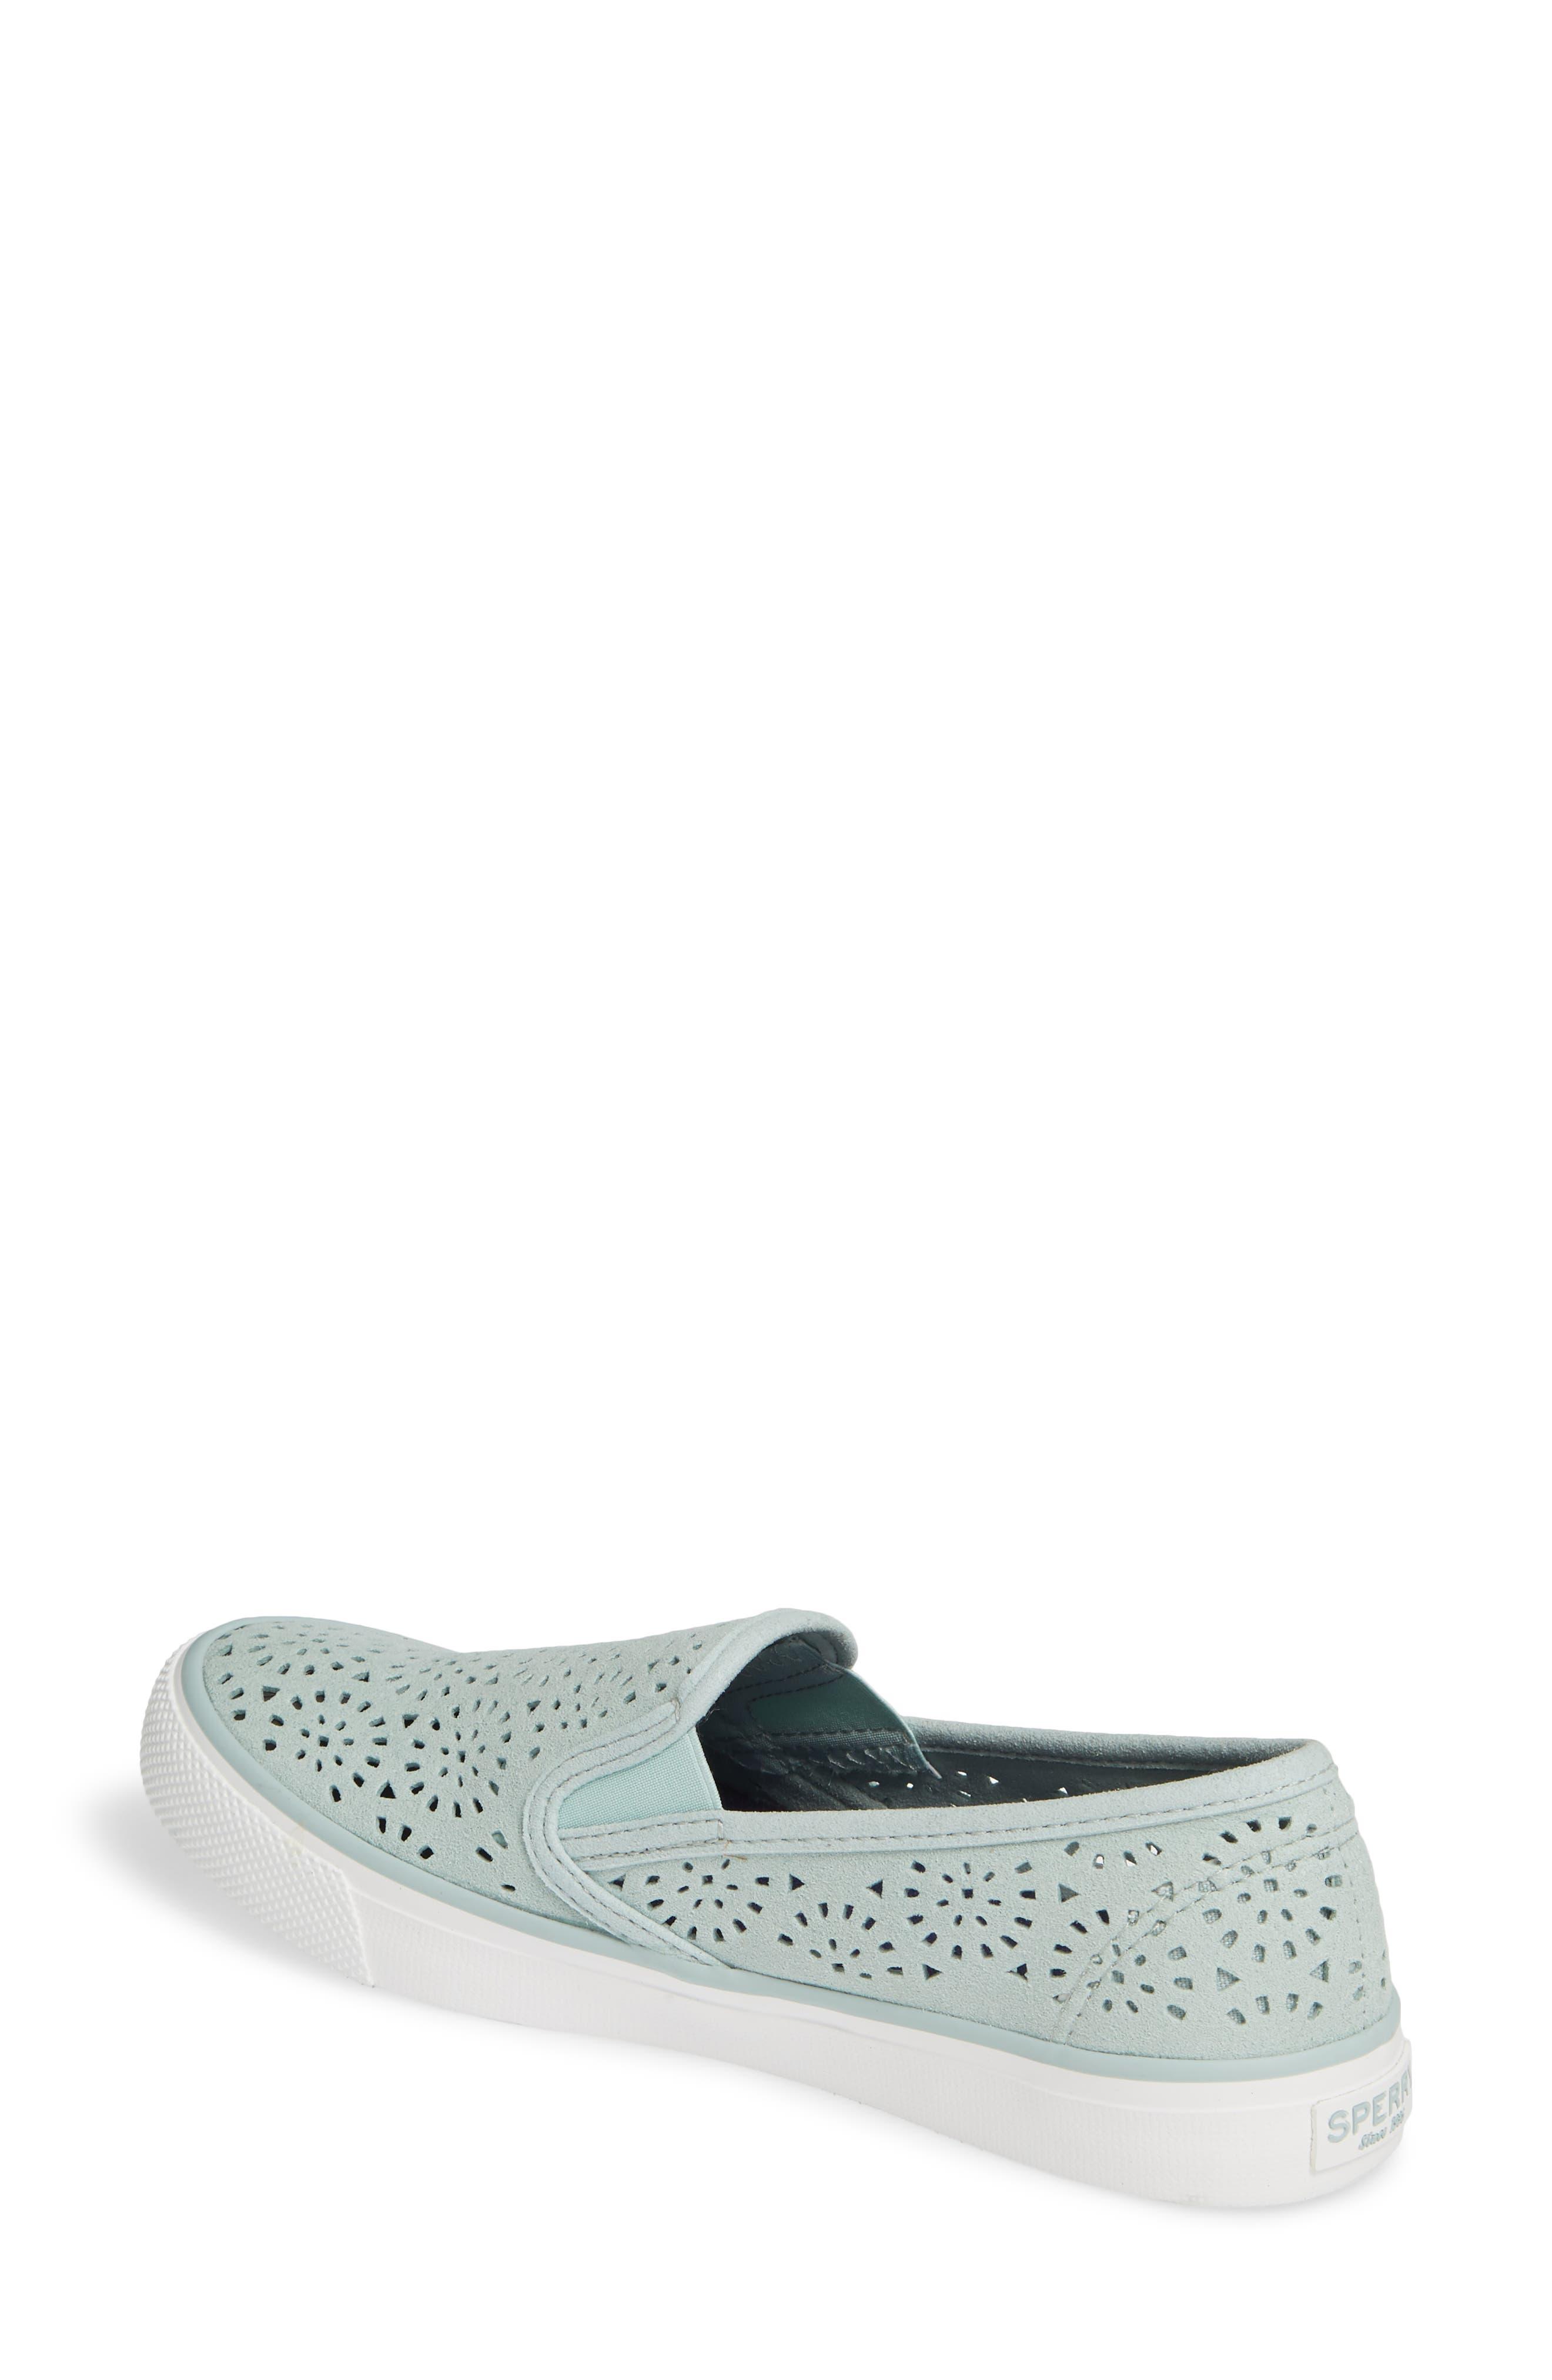 Seaside Nautical Perforated Slip-On Sneaker,                             Alternate thumbnail 2, color,                             MINT NUBUCK LEATHER